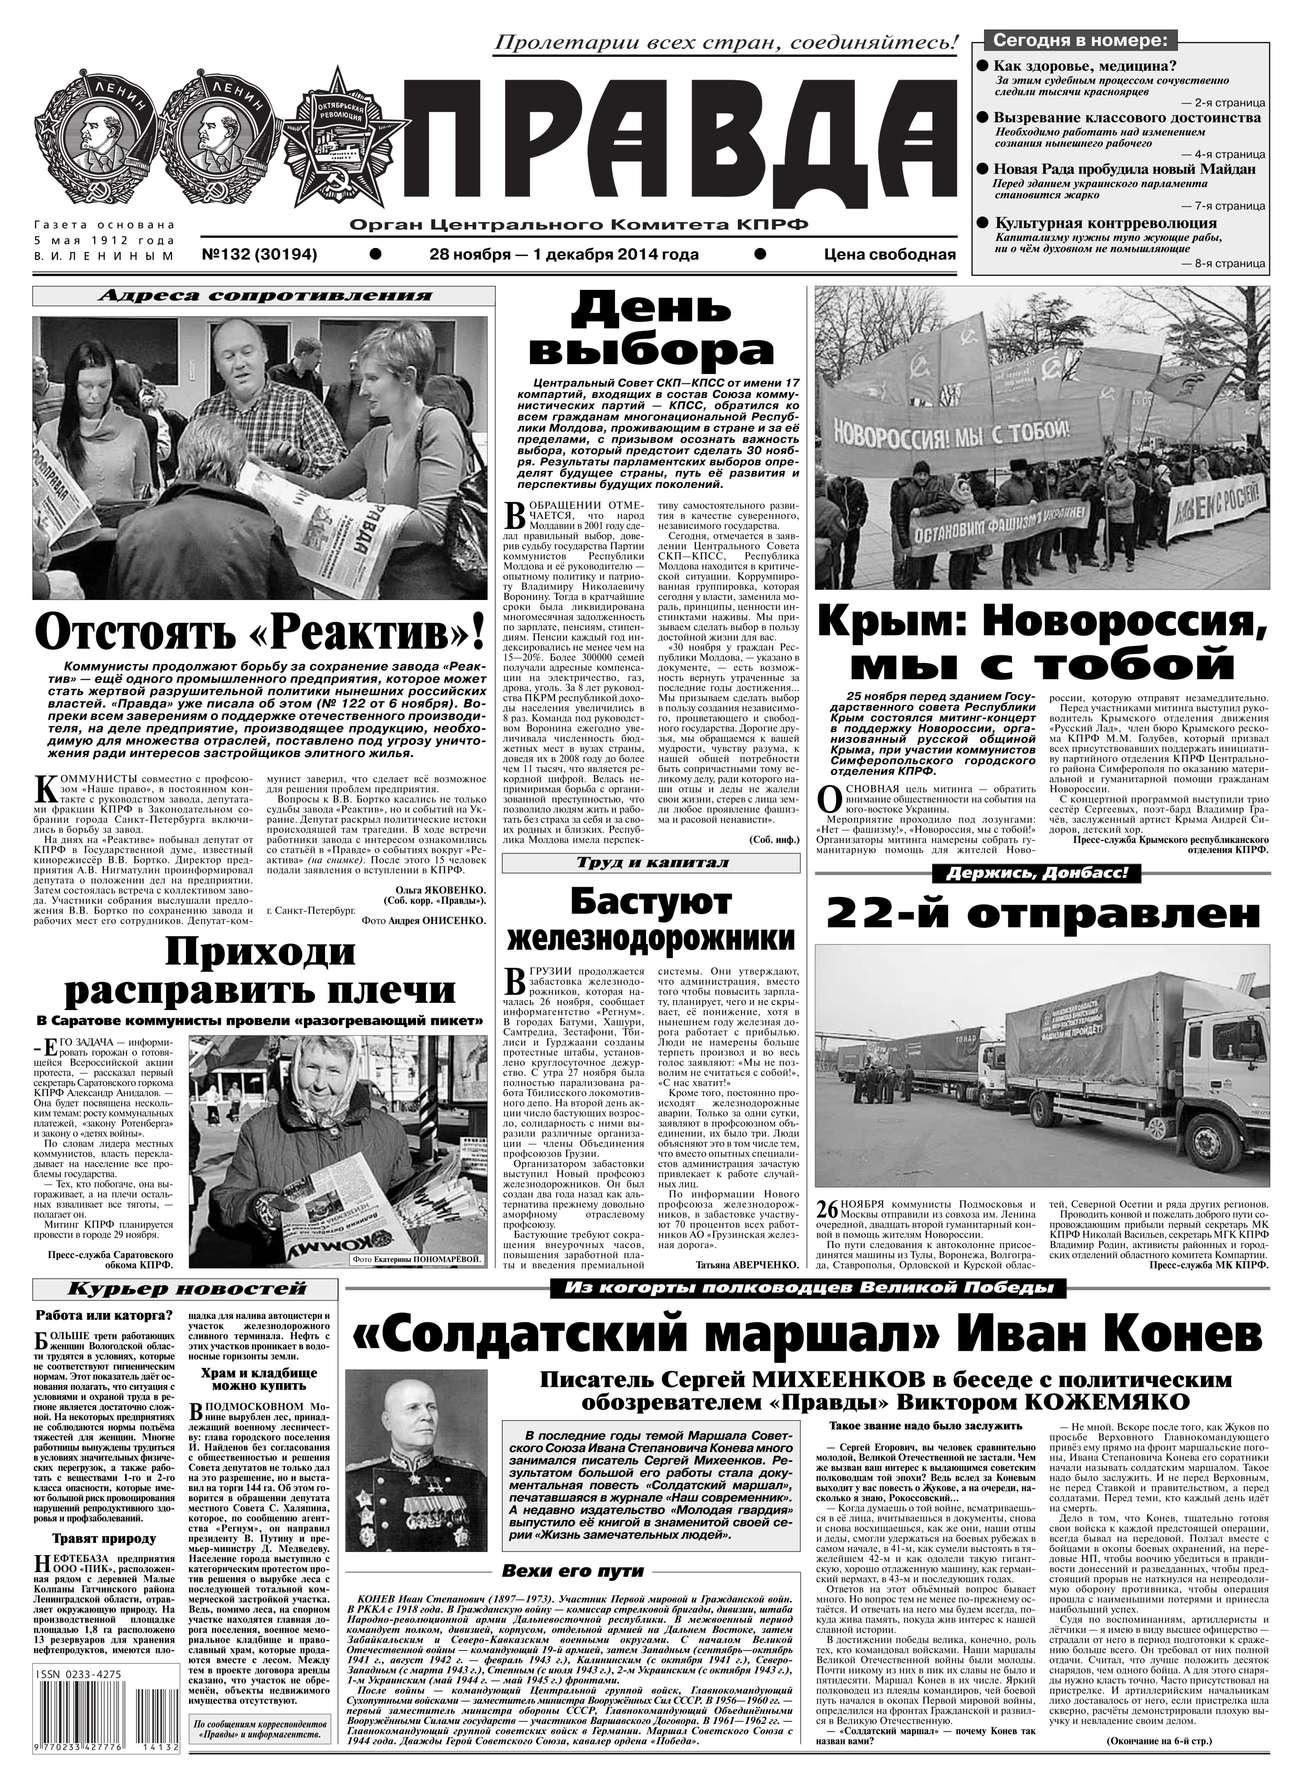 Фото - Редакция газеты Правда Правда 132 газеты